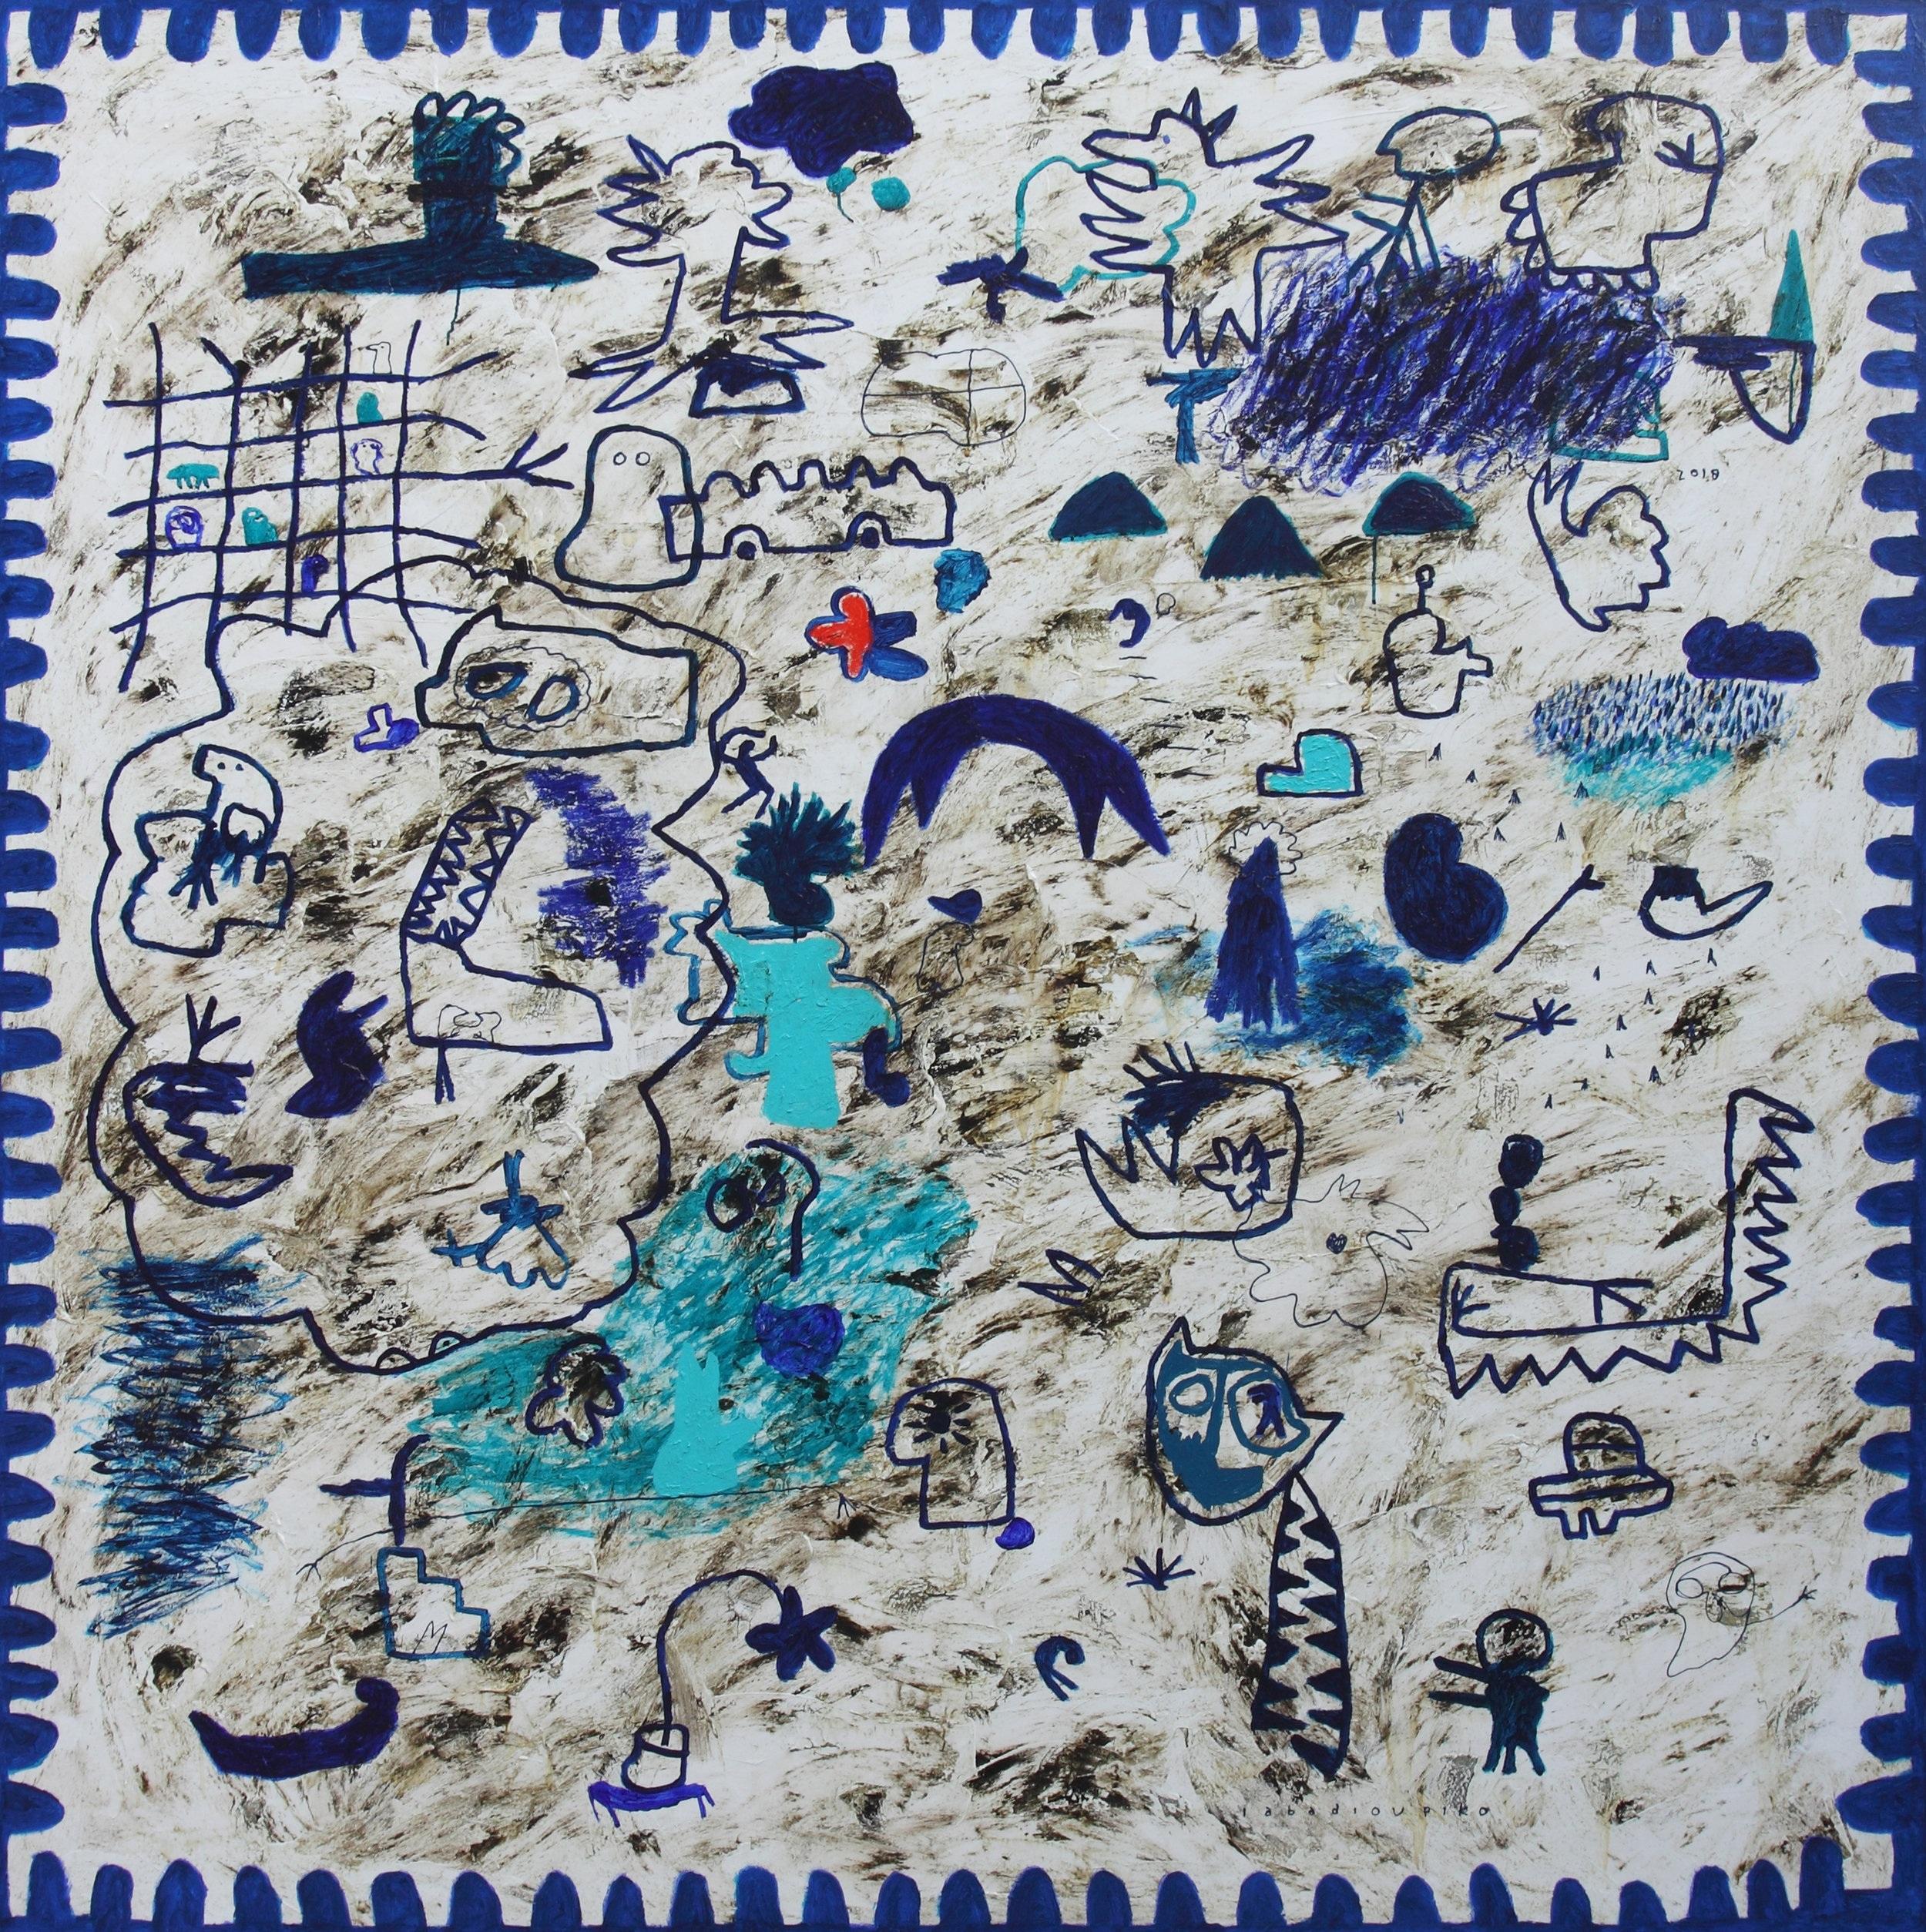 Artist: Iabadiou Piko, (INDONESIA)  Title:  Medium: mixed media on canvas  Dimension: 200 cm x 200 cm Year: 2017